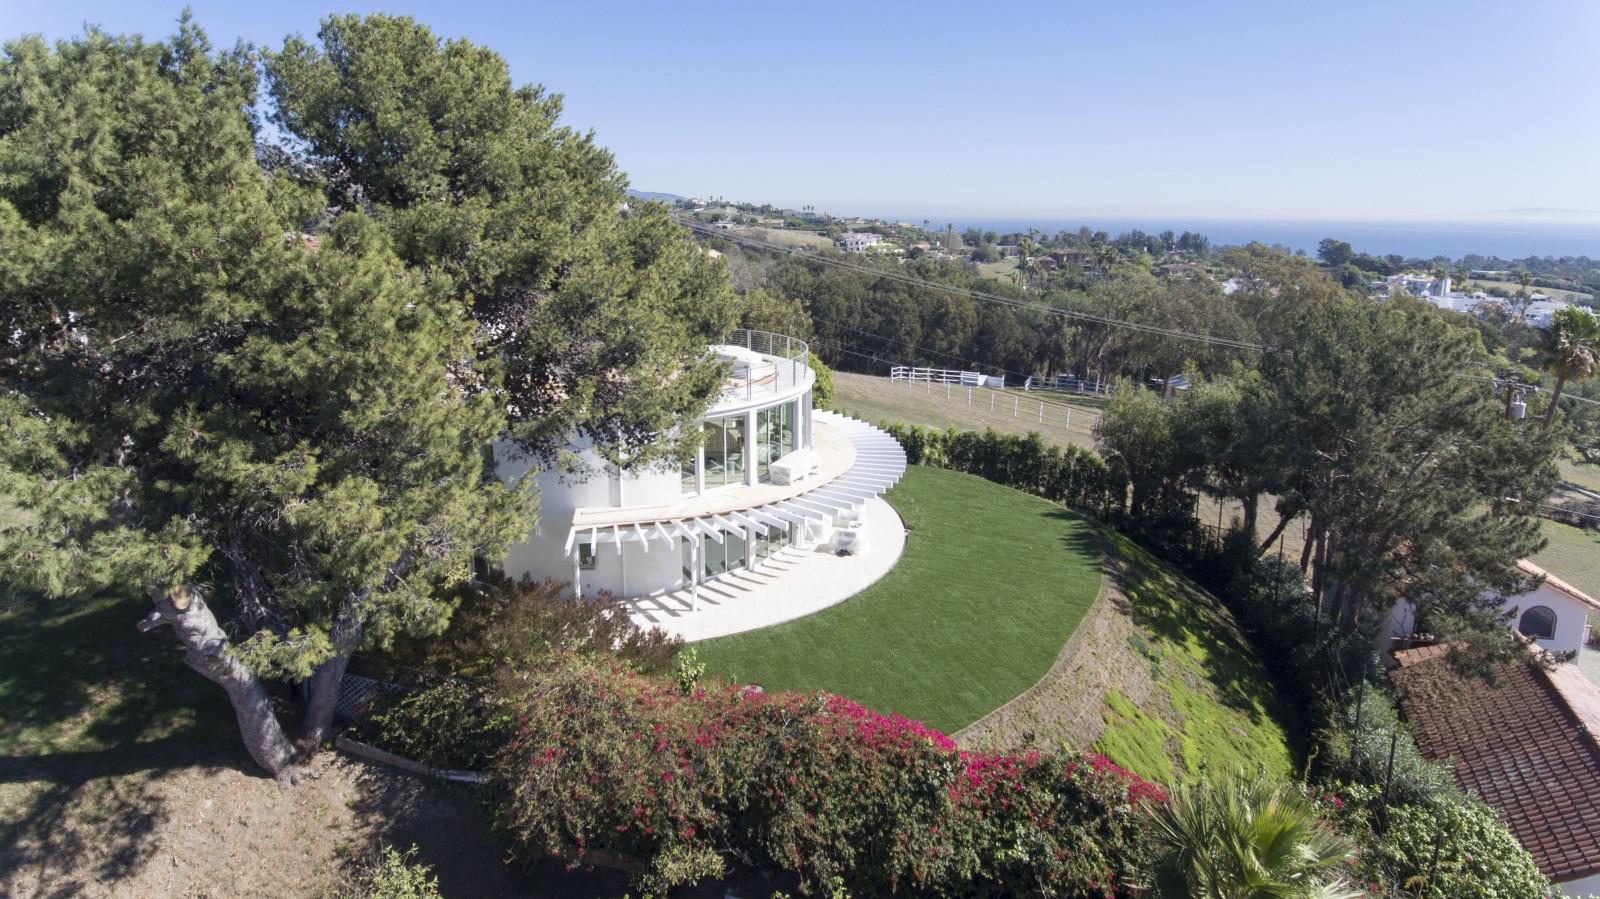 015 Exterior 6375 Gayton Place Malibu For Sale Lease The Malibu Life Team Luxury Real Estate